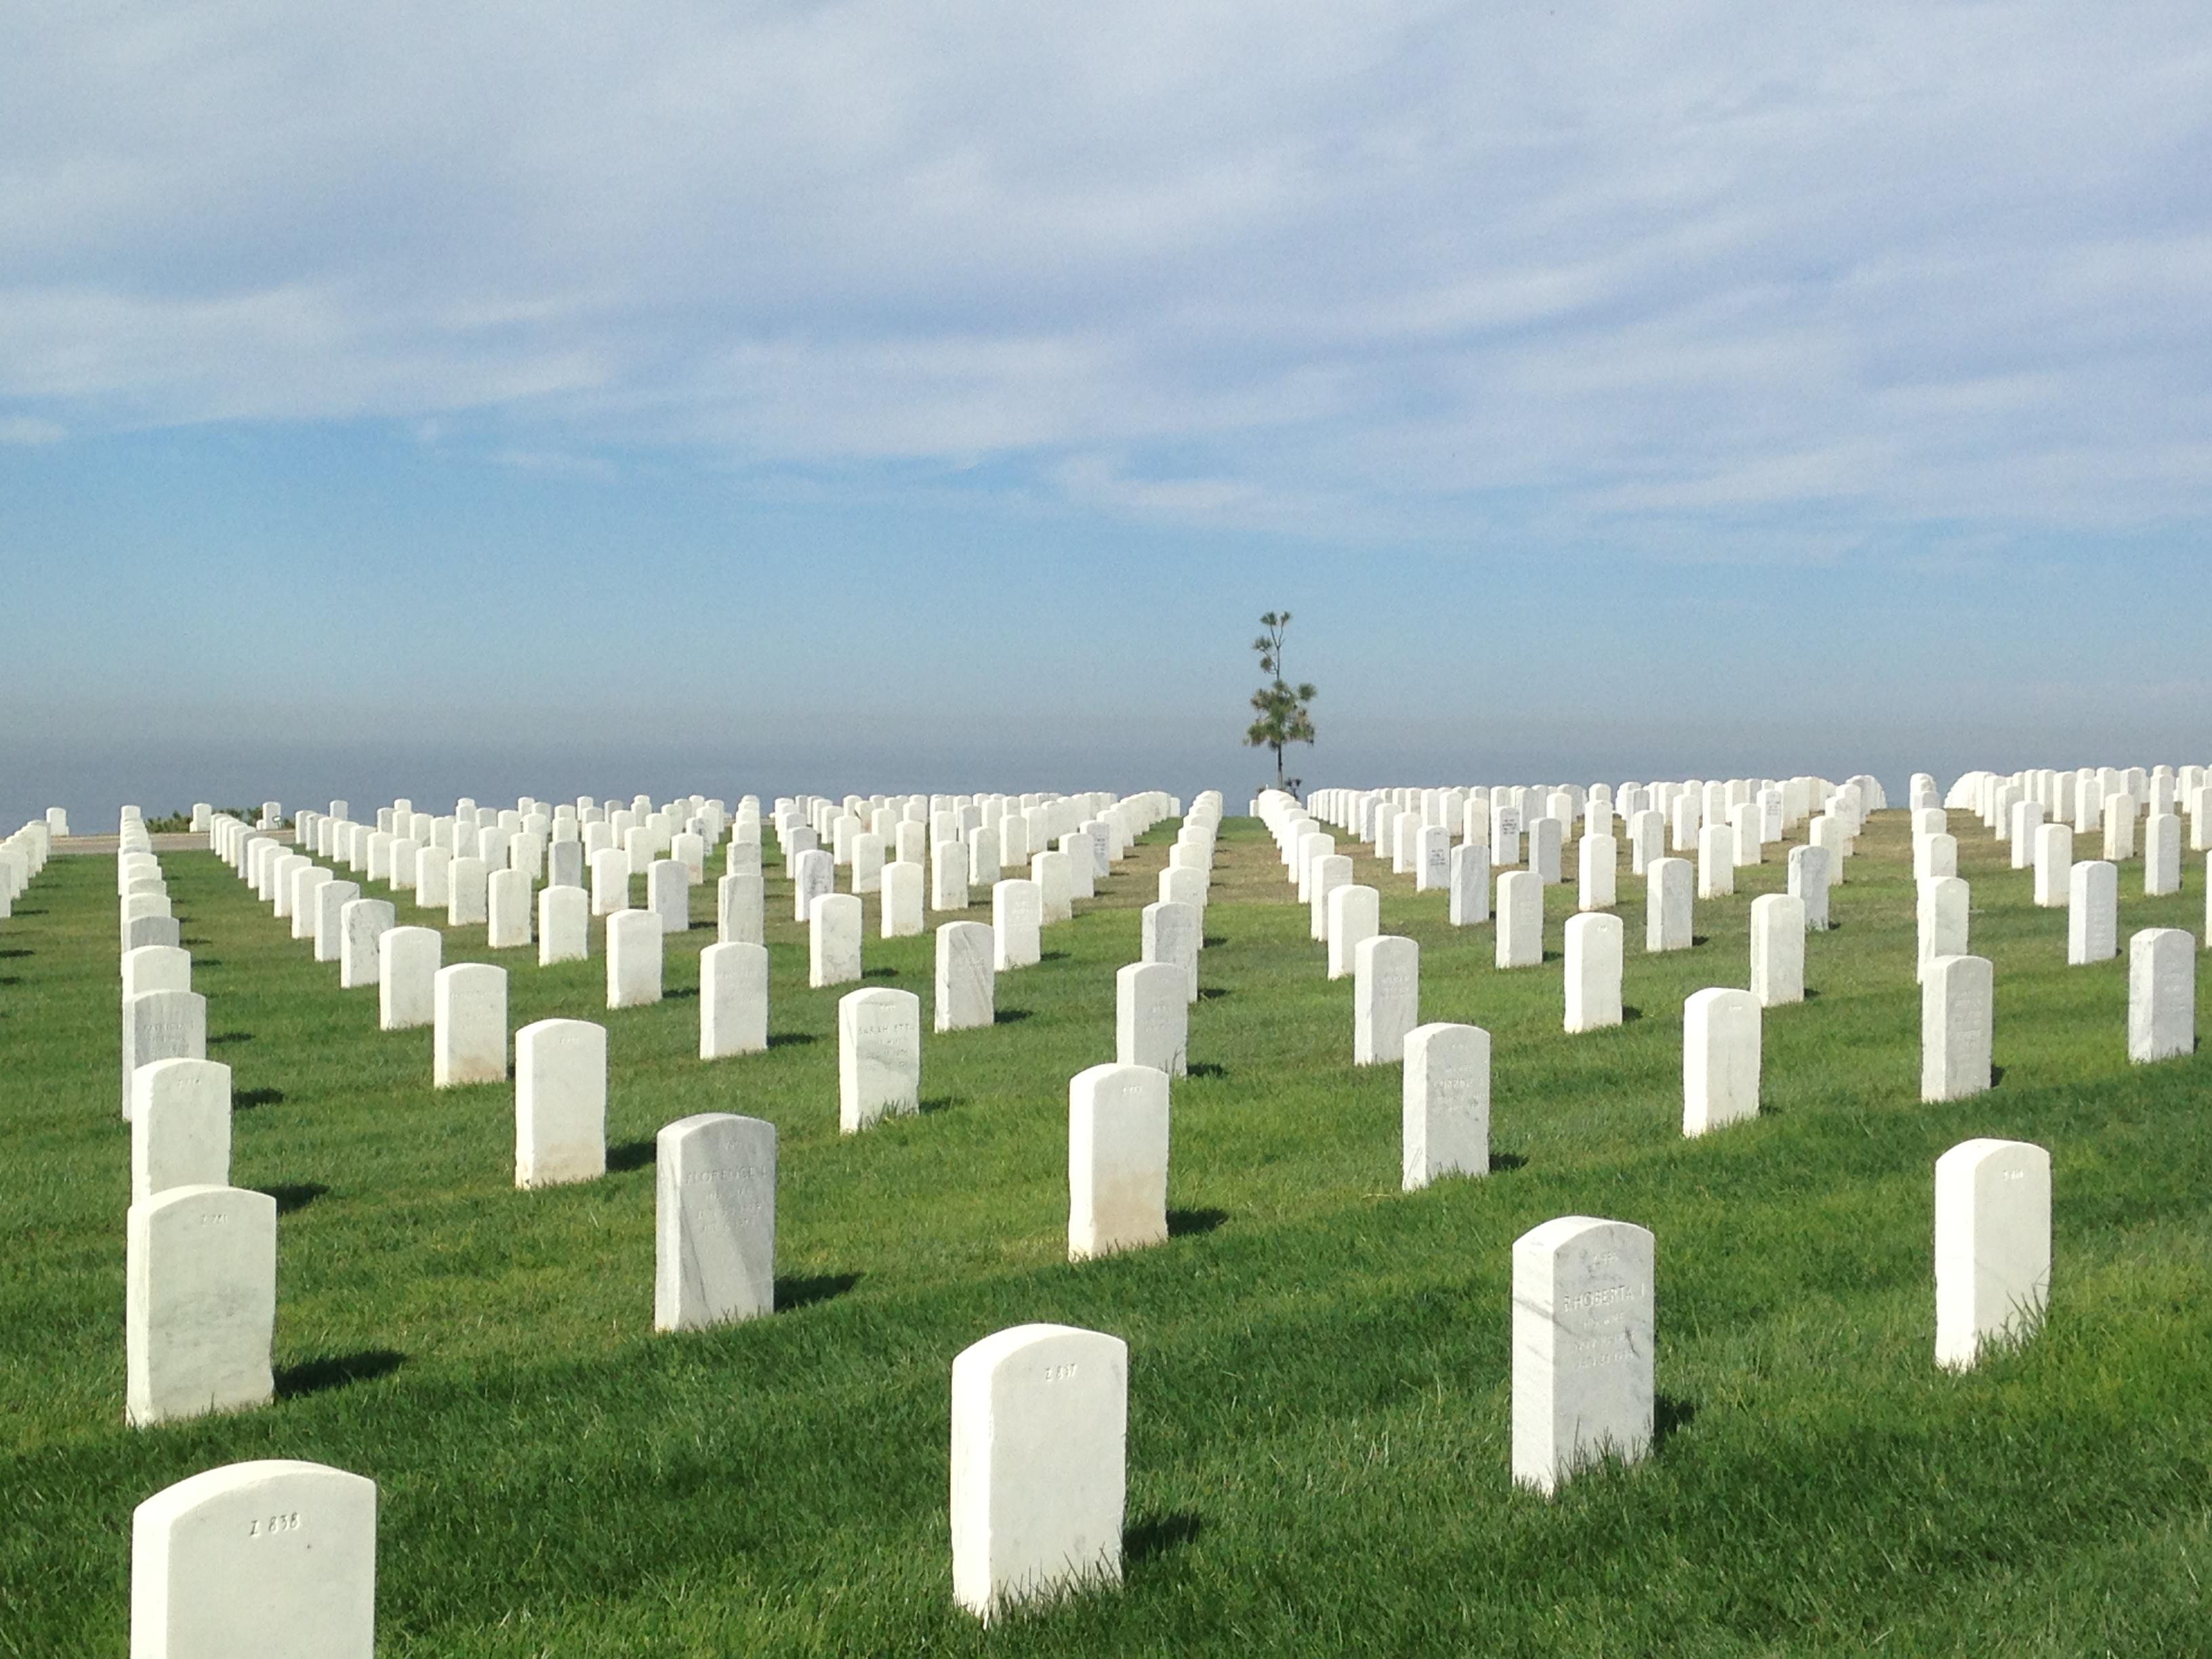 Cemeteries | Jim and Nancy Beletti